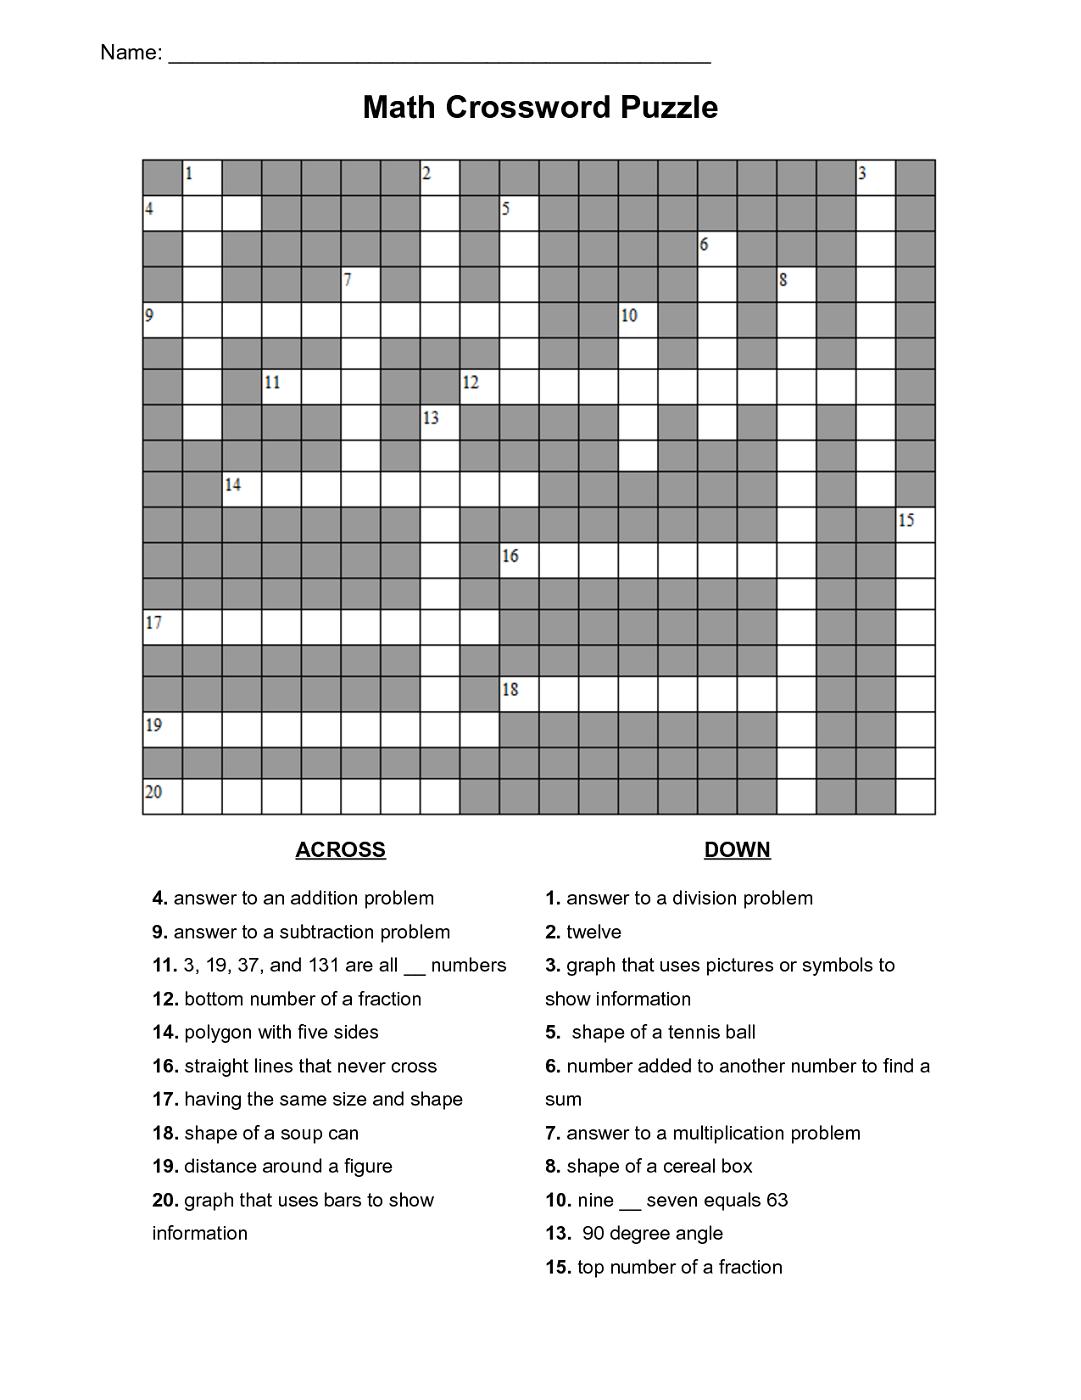 Maths Puzzles For Kids Crossword | Activities | Maths Puzzles, Kids - Free Printable Crossword Puzzle #7